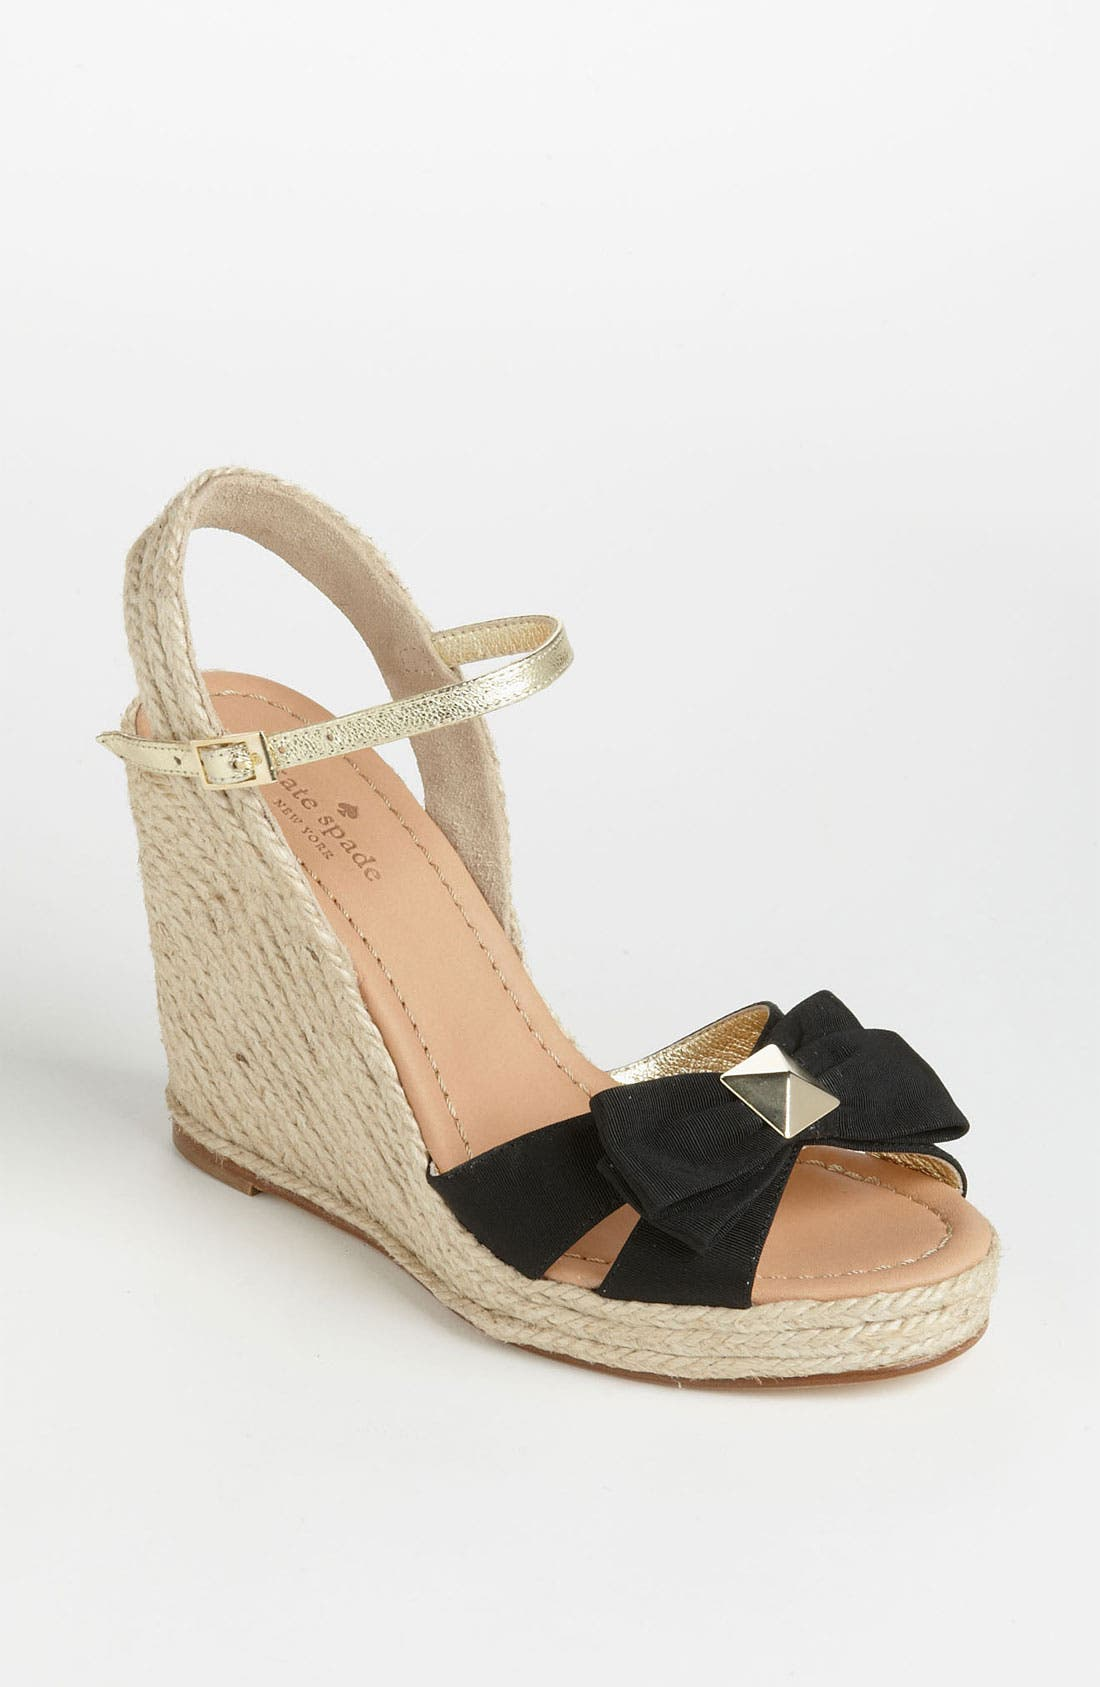 Alternate Image 1 Selected - kate spade new york 'carmelita' wedge sandal